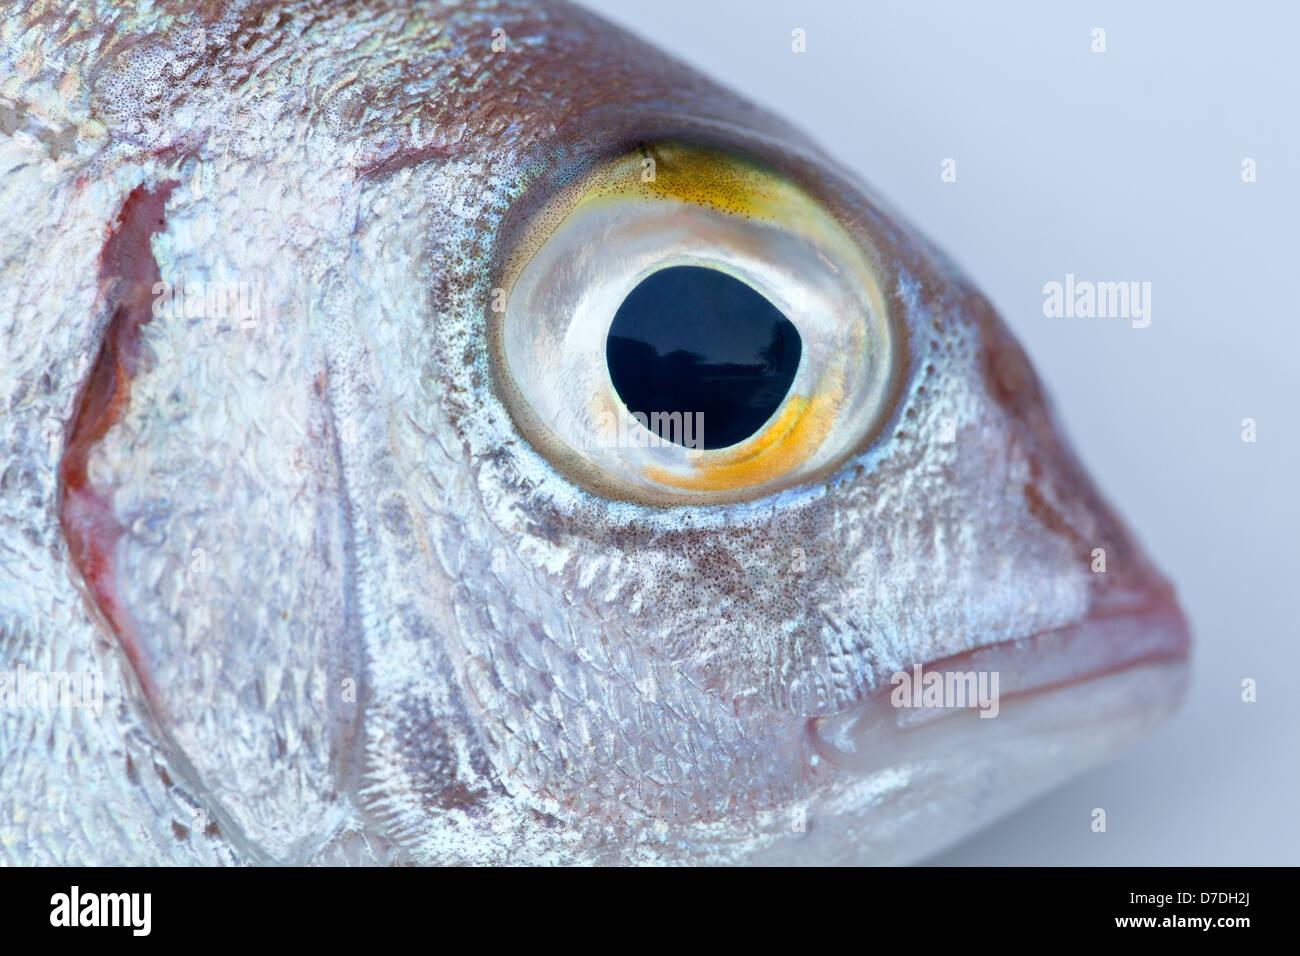 Eye of red sea bream Stock Photo